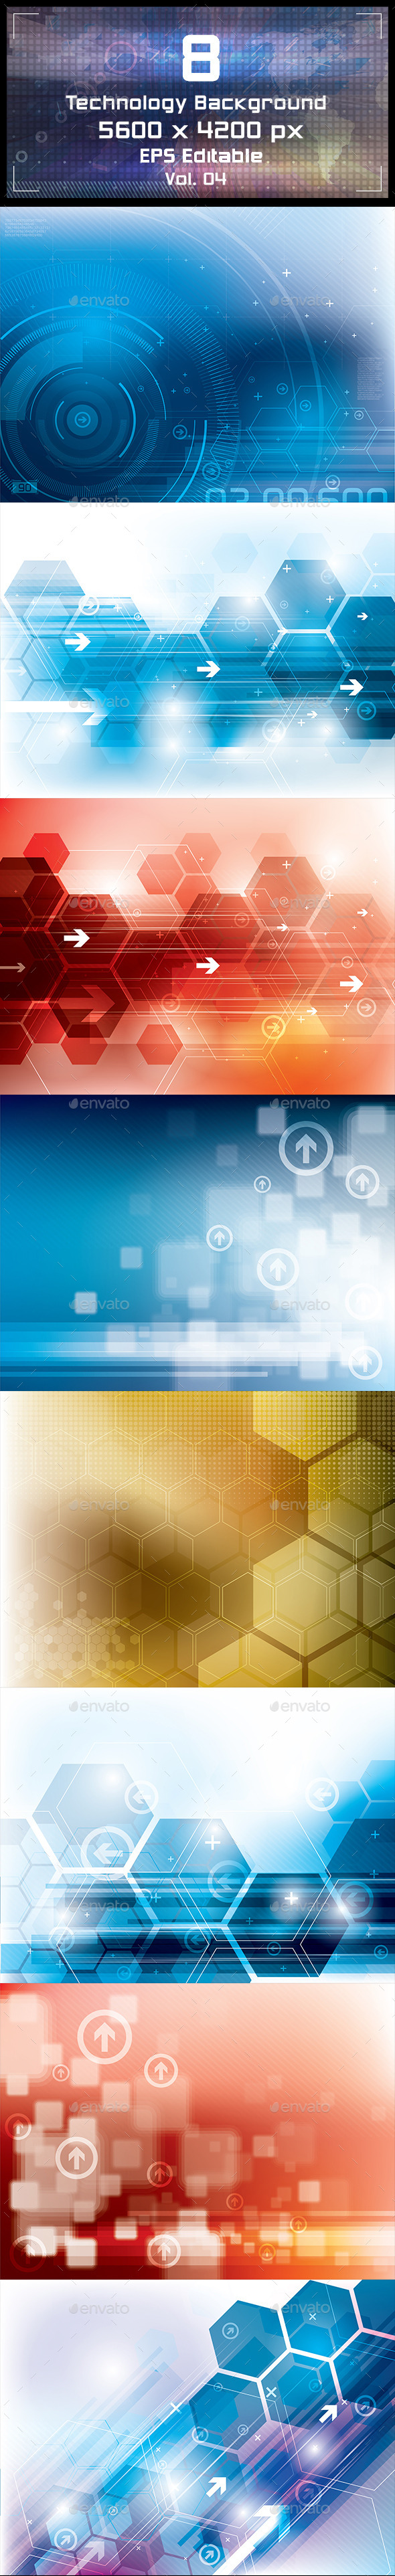 Technology Backgrounds - Technology Conceptual